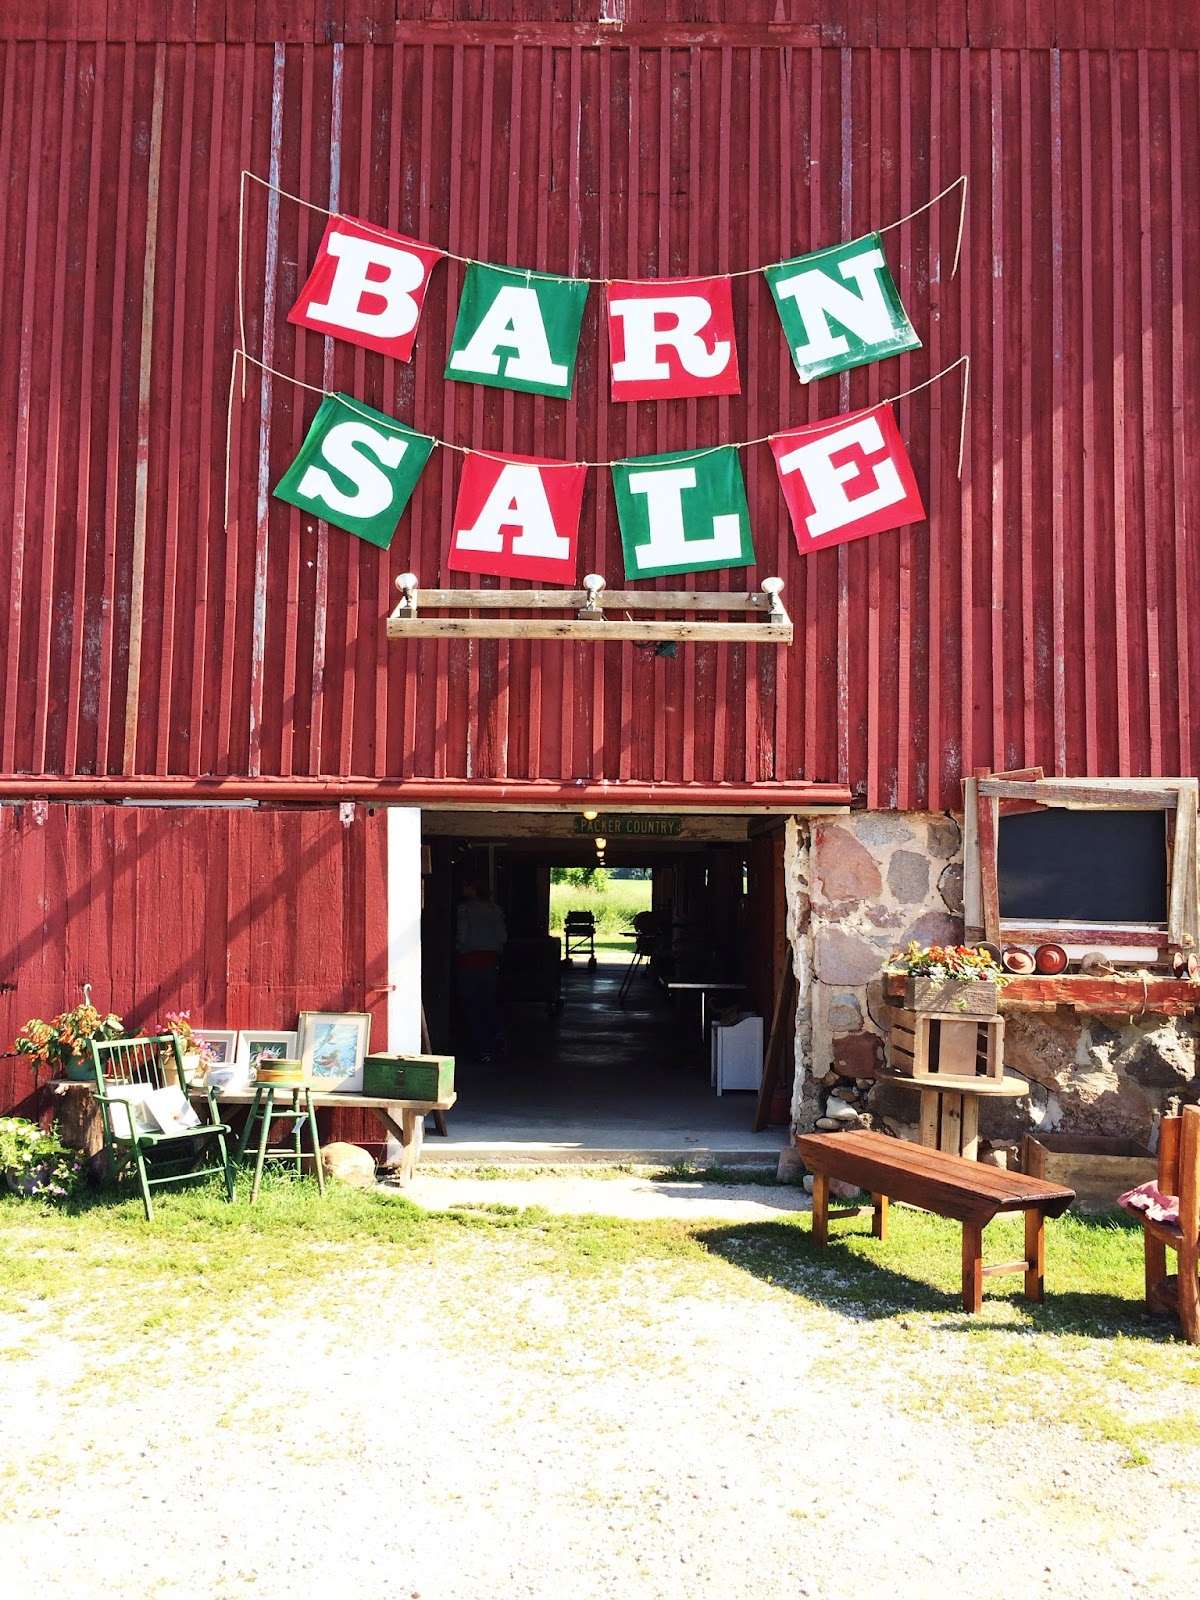 Avery Street Design Blog: heritage beam & board barn sale